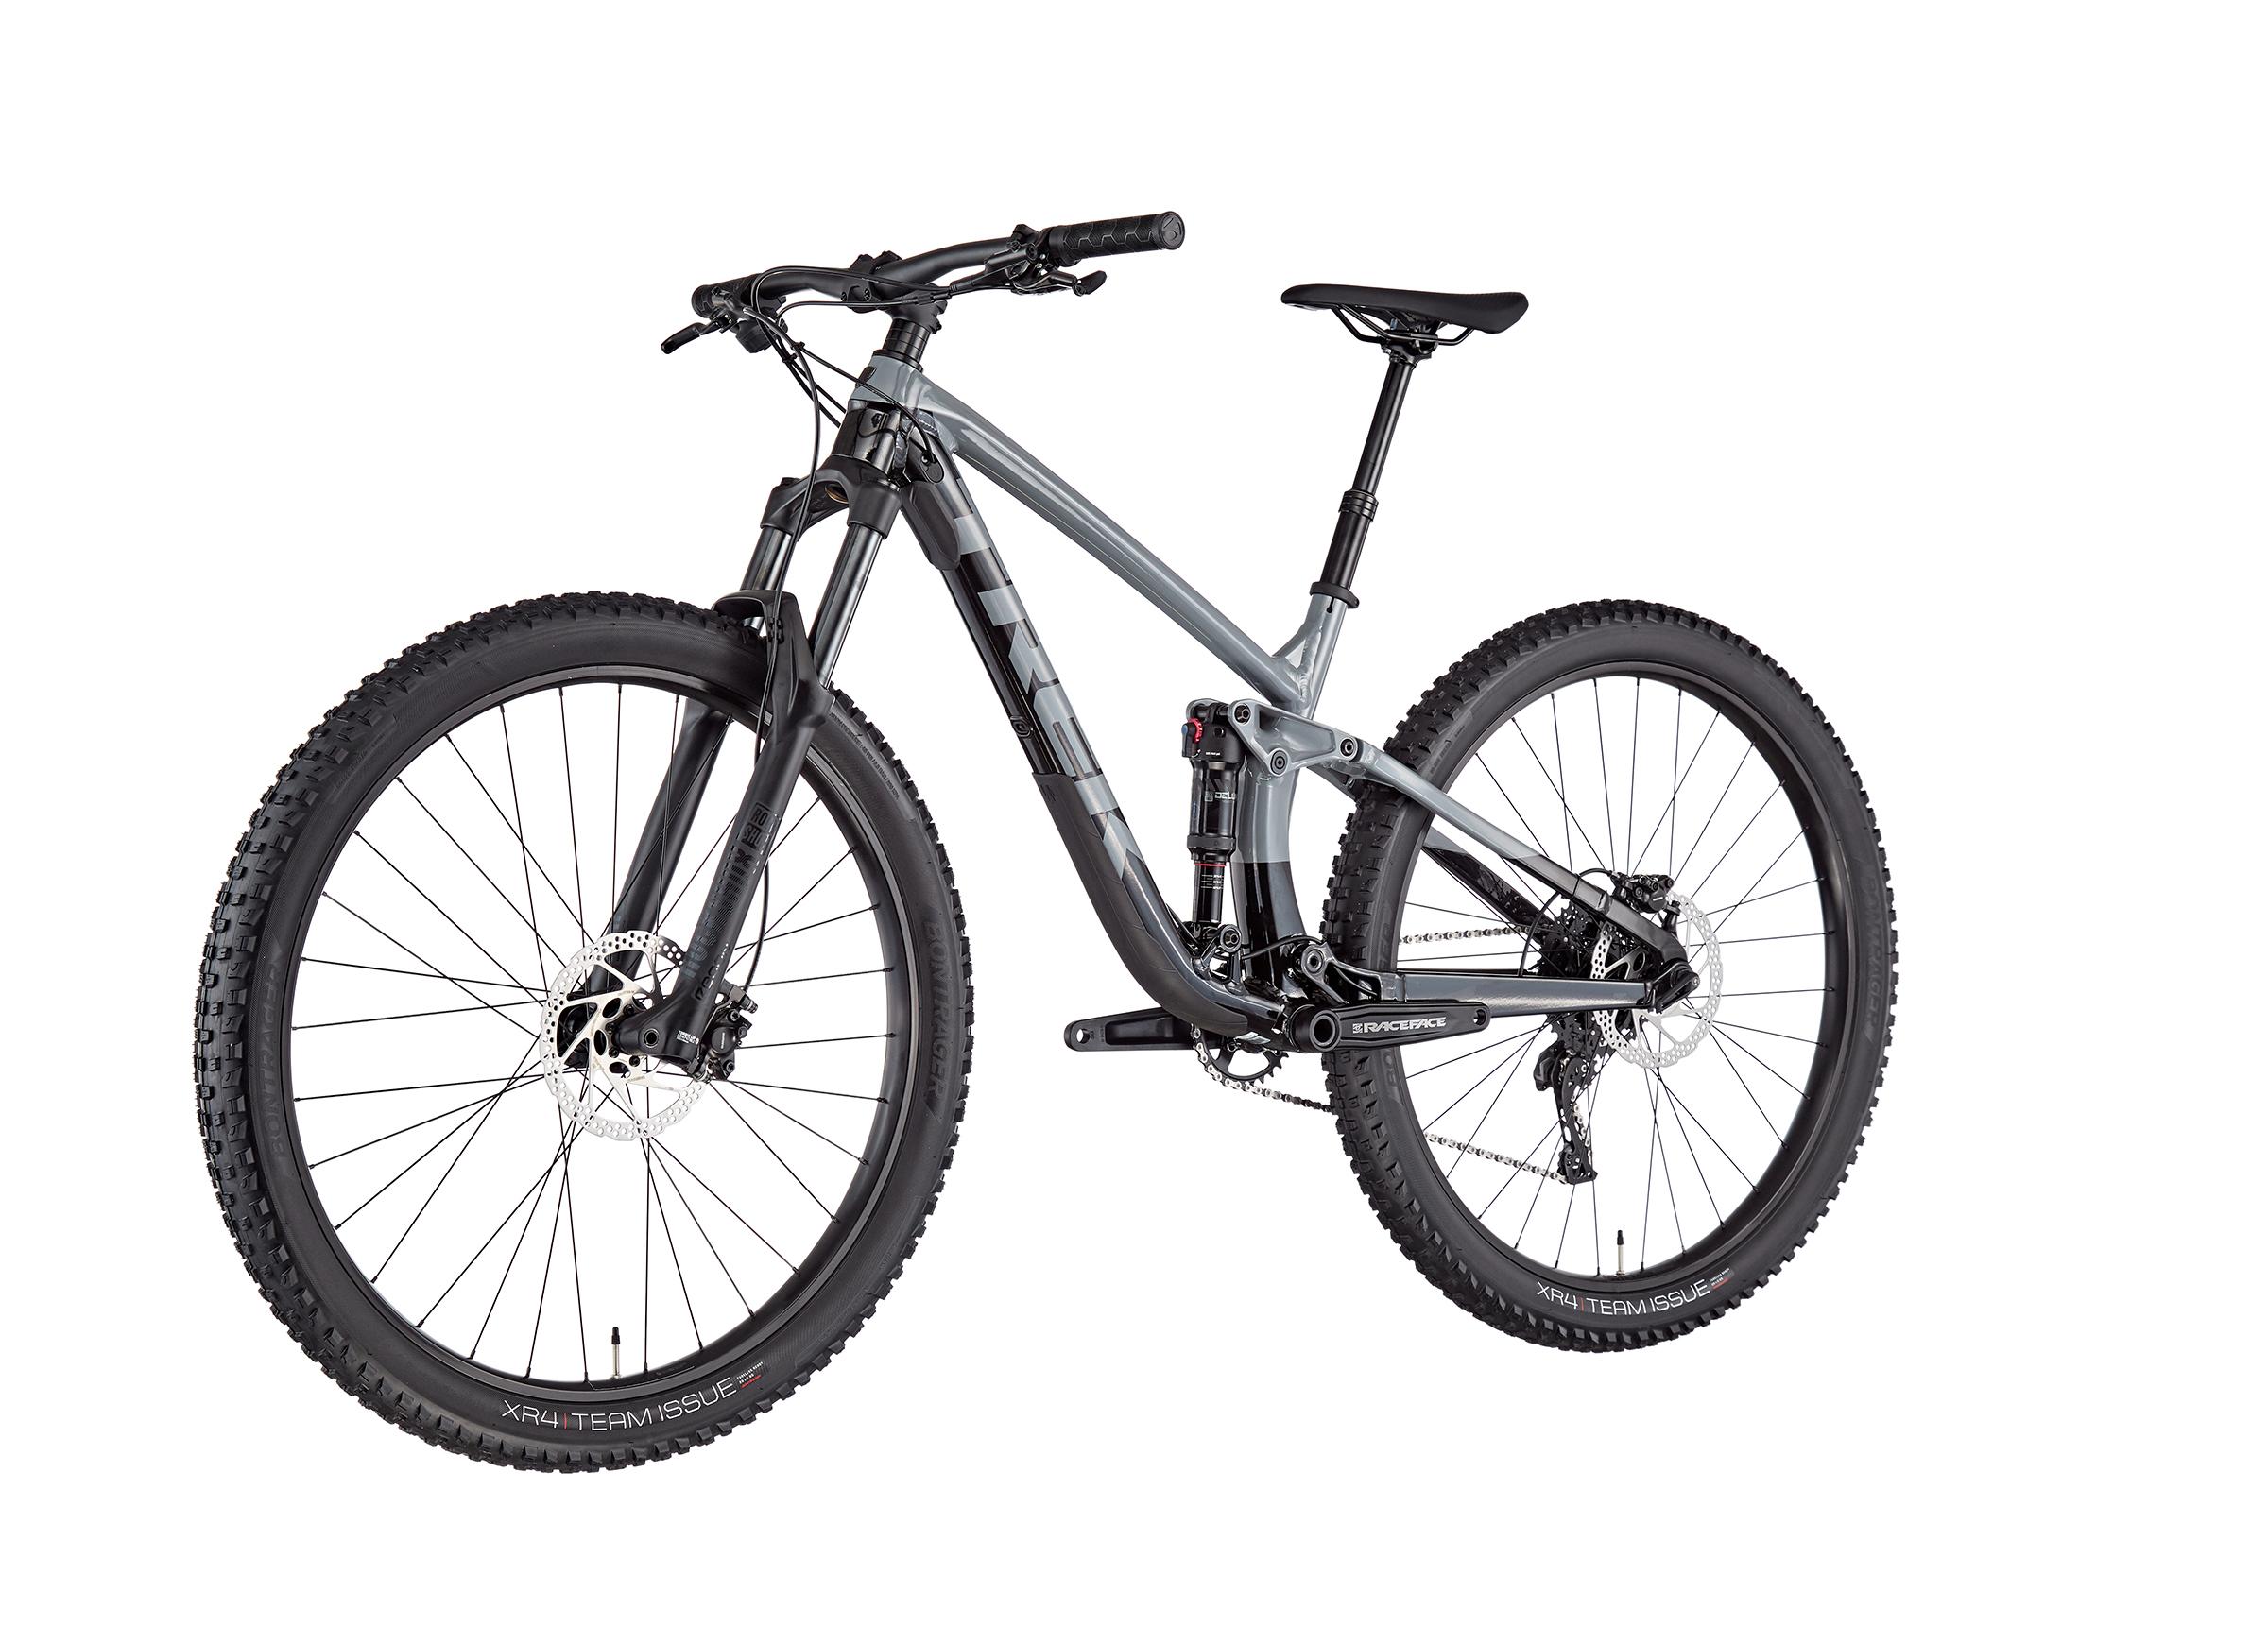 Trek Fuel EX 5 slate/trek black